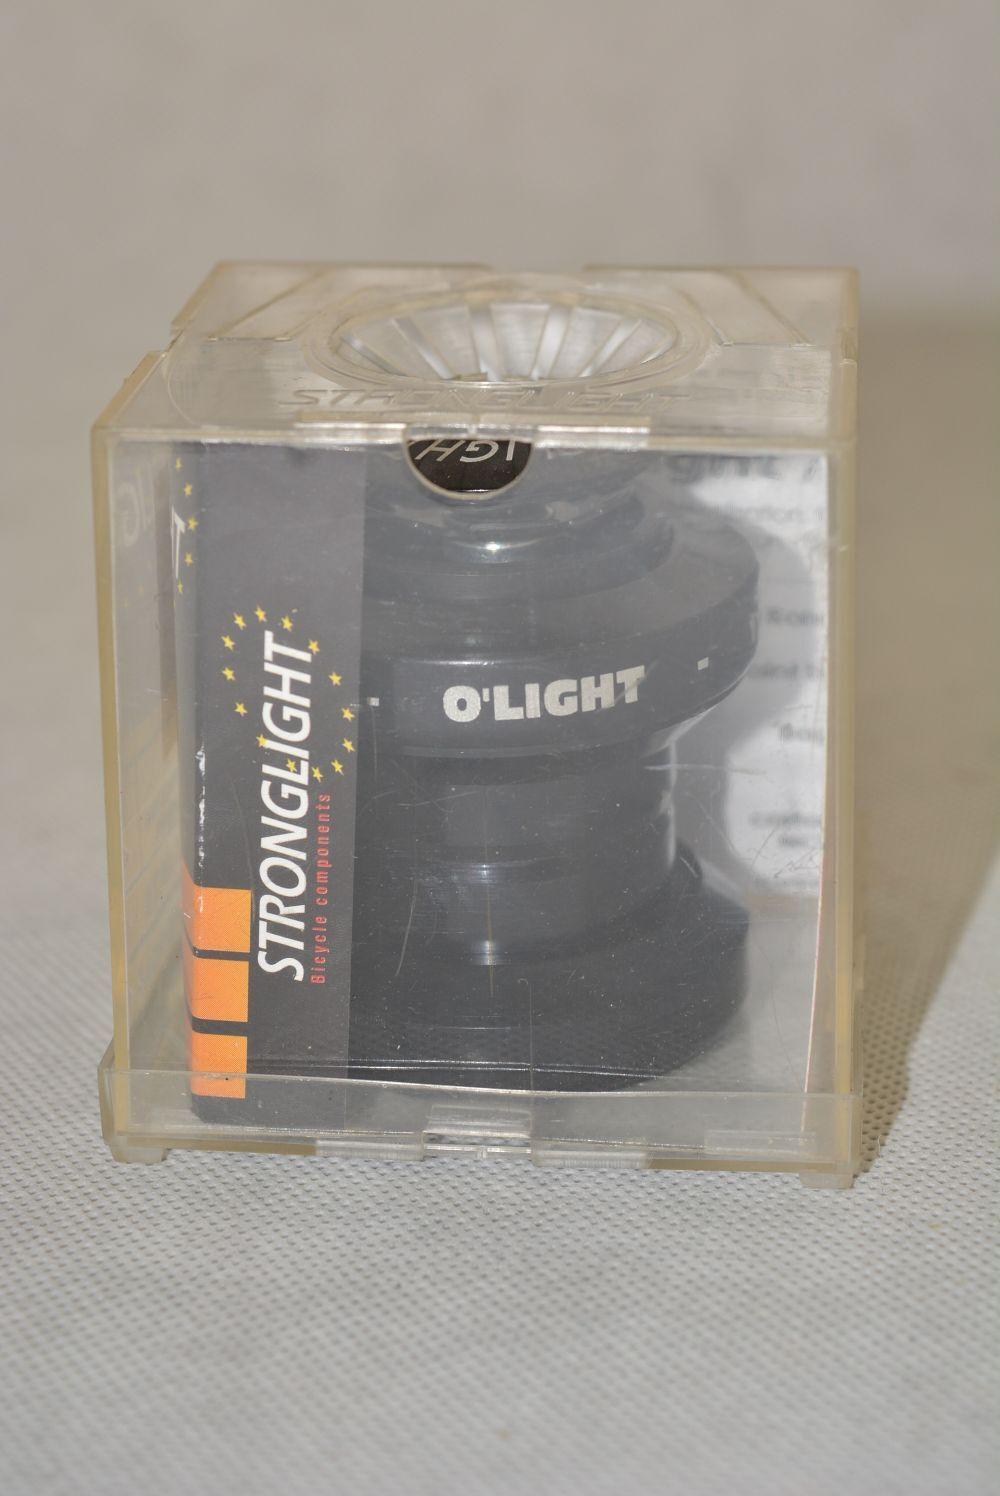 STRONGLIGHT S252216 JD ' OLIGHT NCS 1p1 8 black headset   new, nos, nib